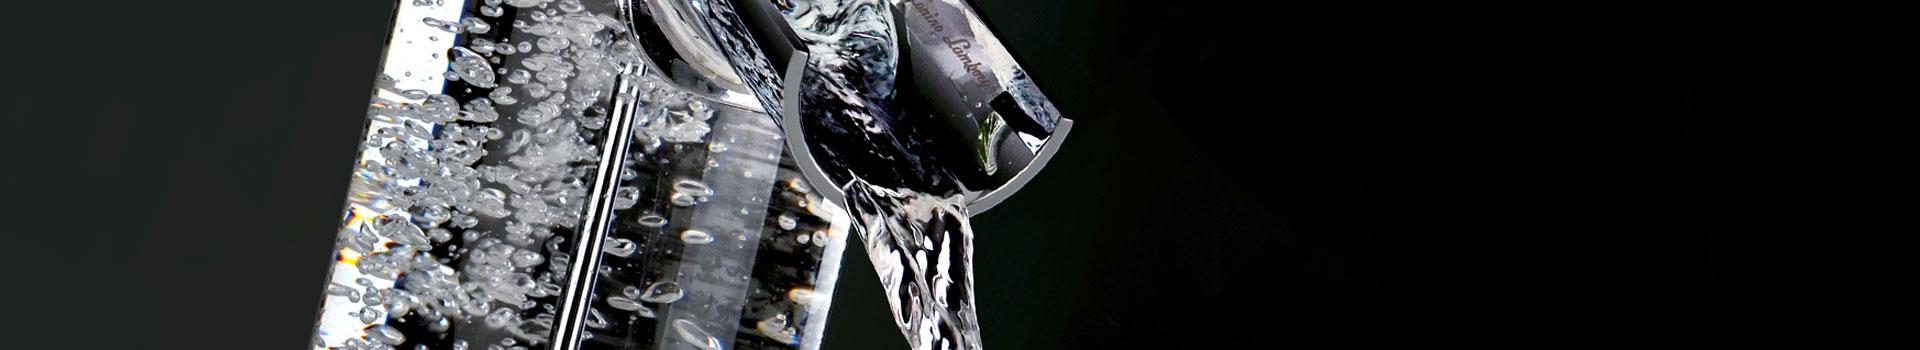 Tonino Lamborghini Water Design